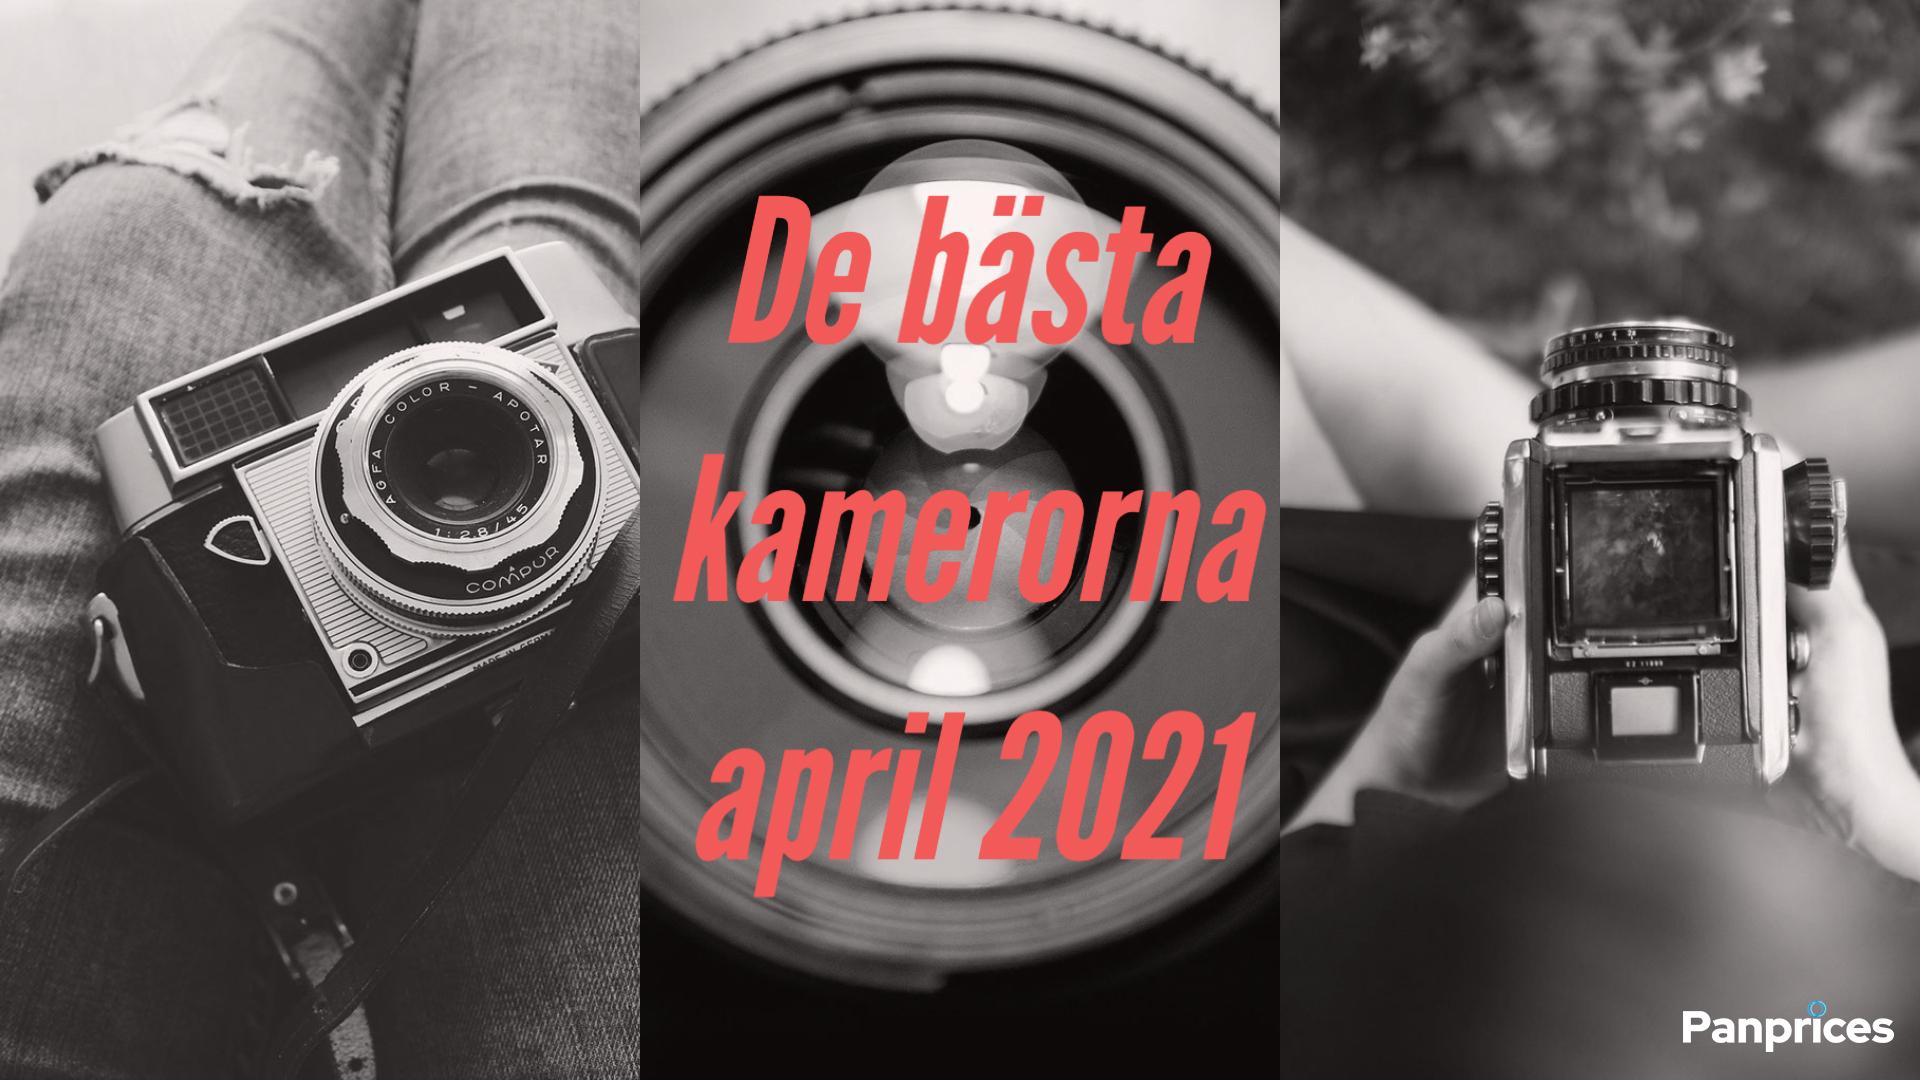 De bästa kamerorna april 2021